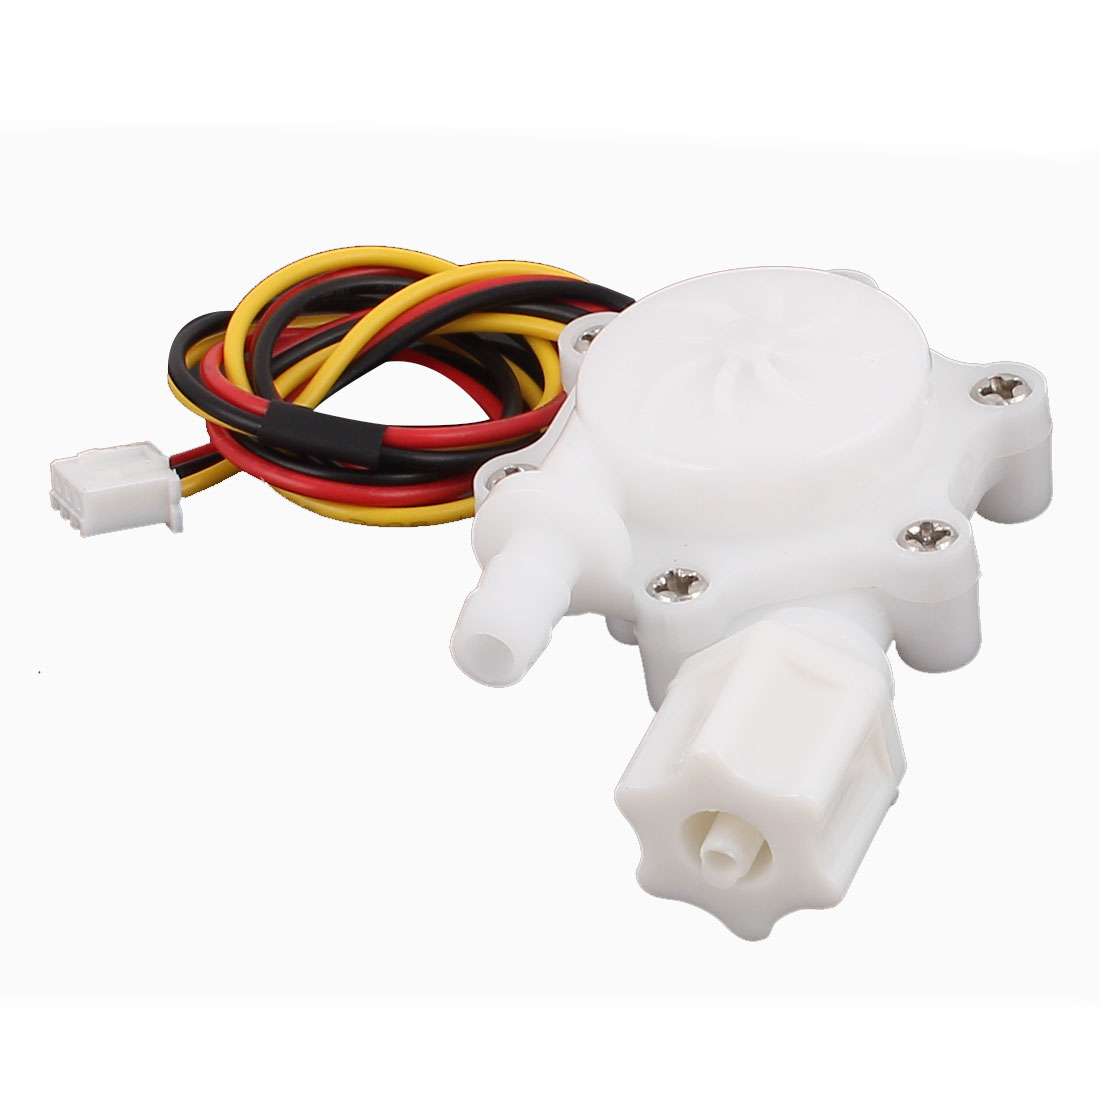 G1/4 Male Thread 6mm Outlet Outer Dia Water Flow Sensor 0.15-1.5L/min SEN-HW06FB